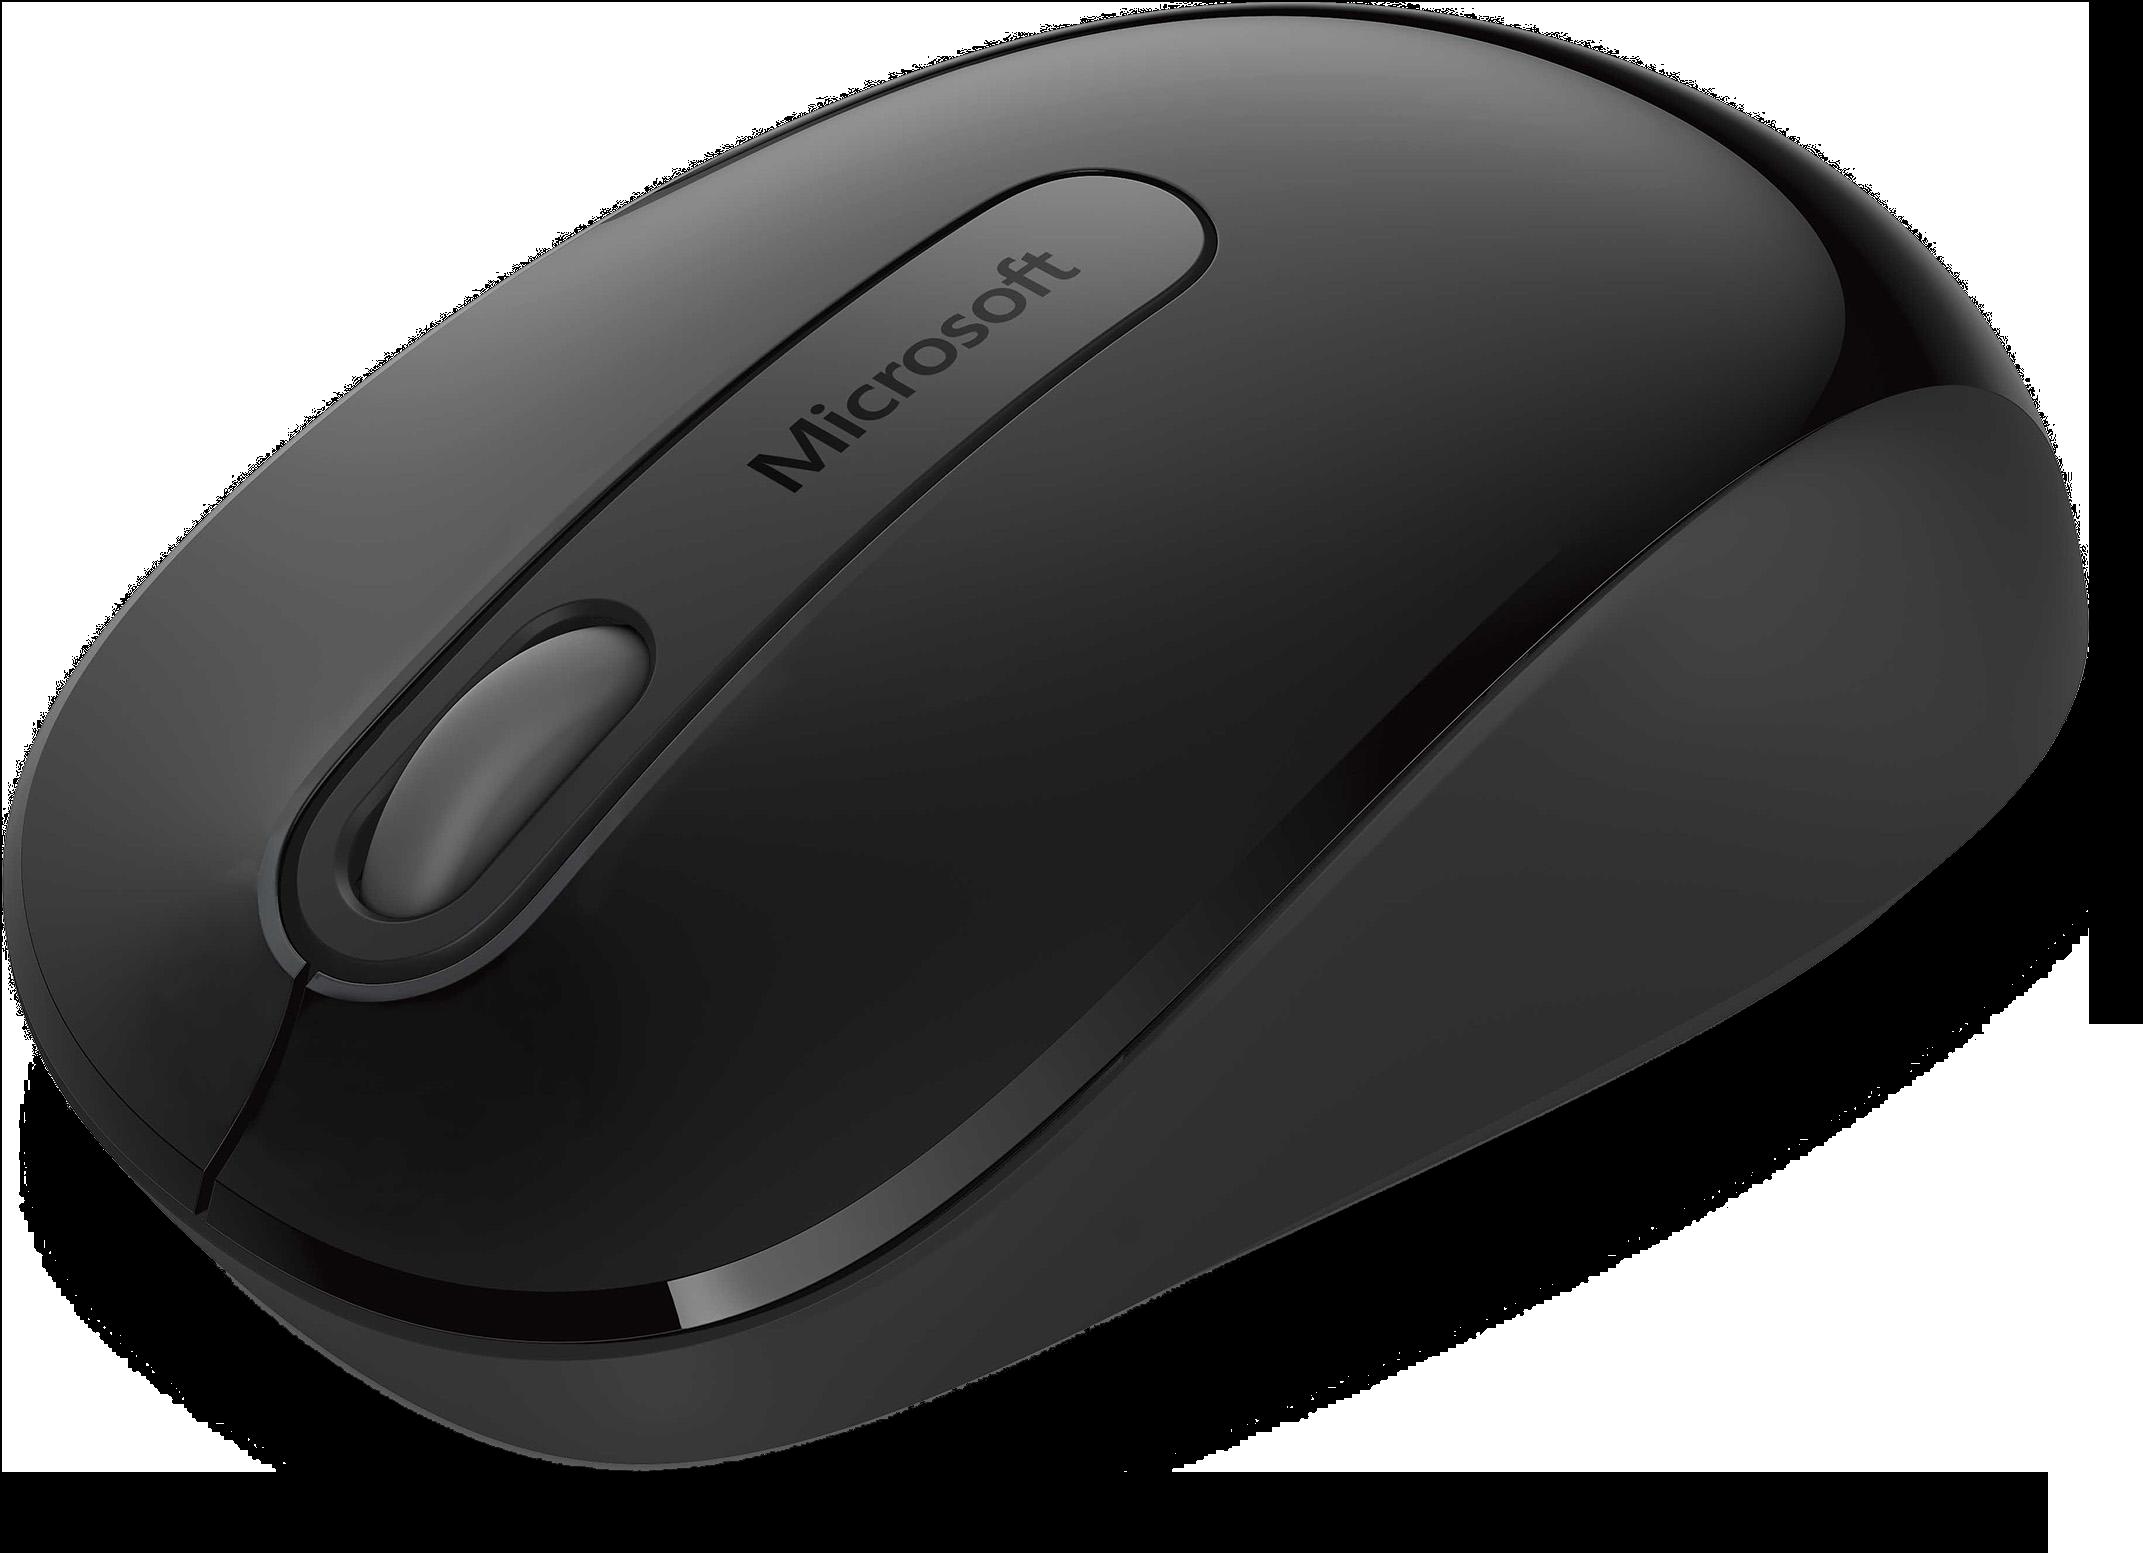 Microsoft trådlös mus 900